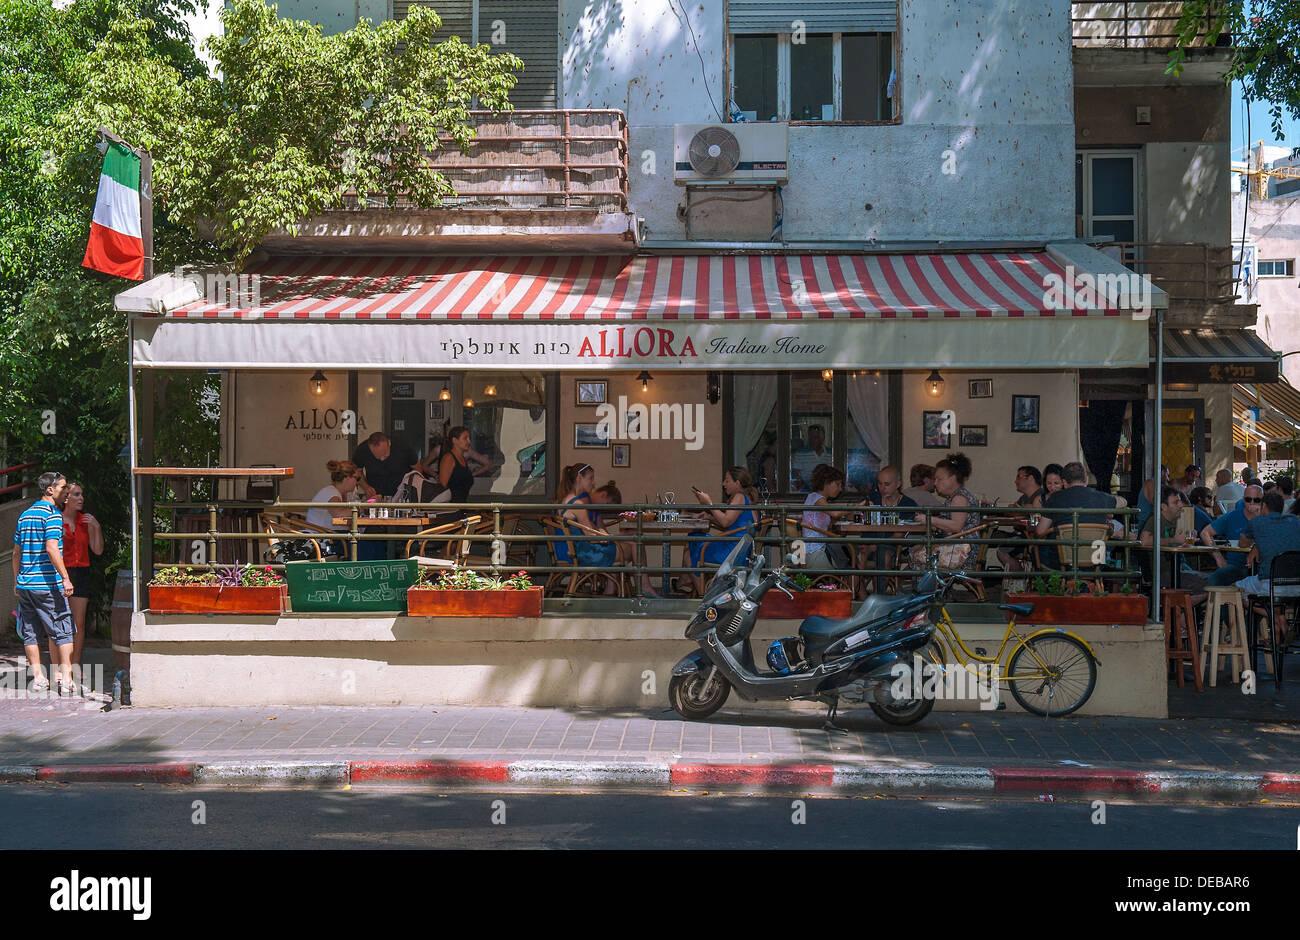 Allora, Italian Caffe & restaurant in Rothschild Boulevard, Tel Aviv, Israel - Stock Image